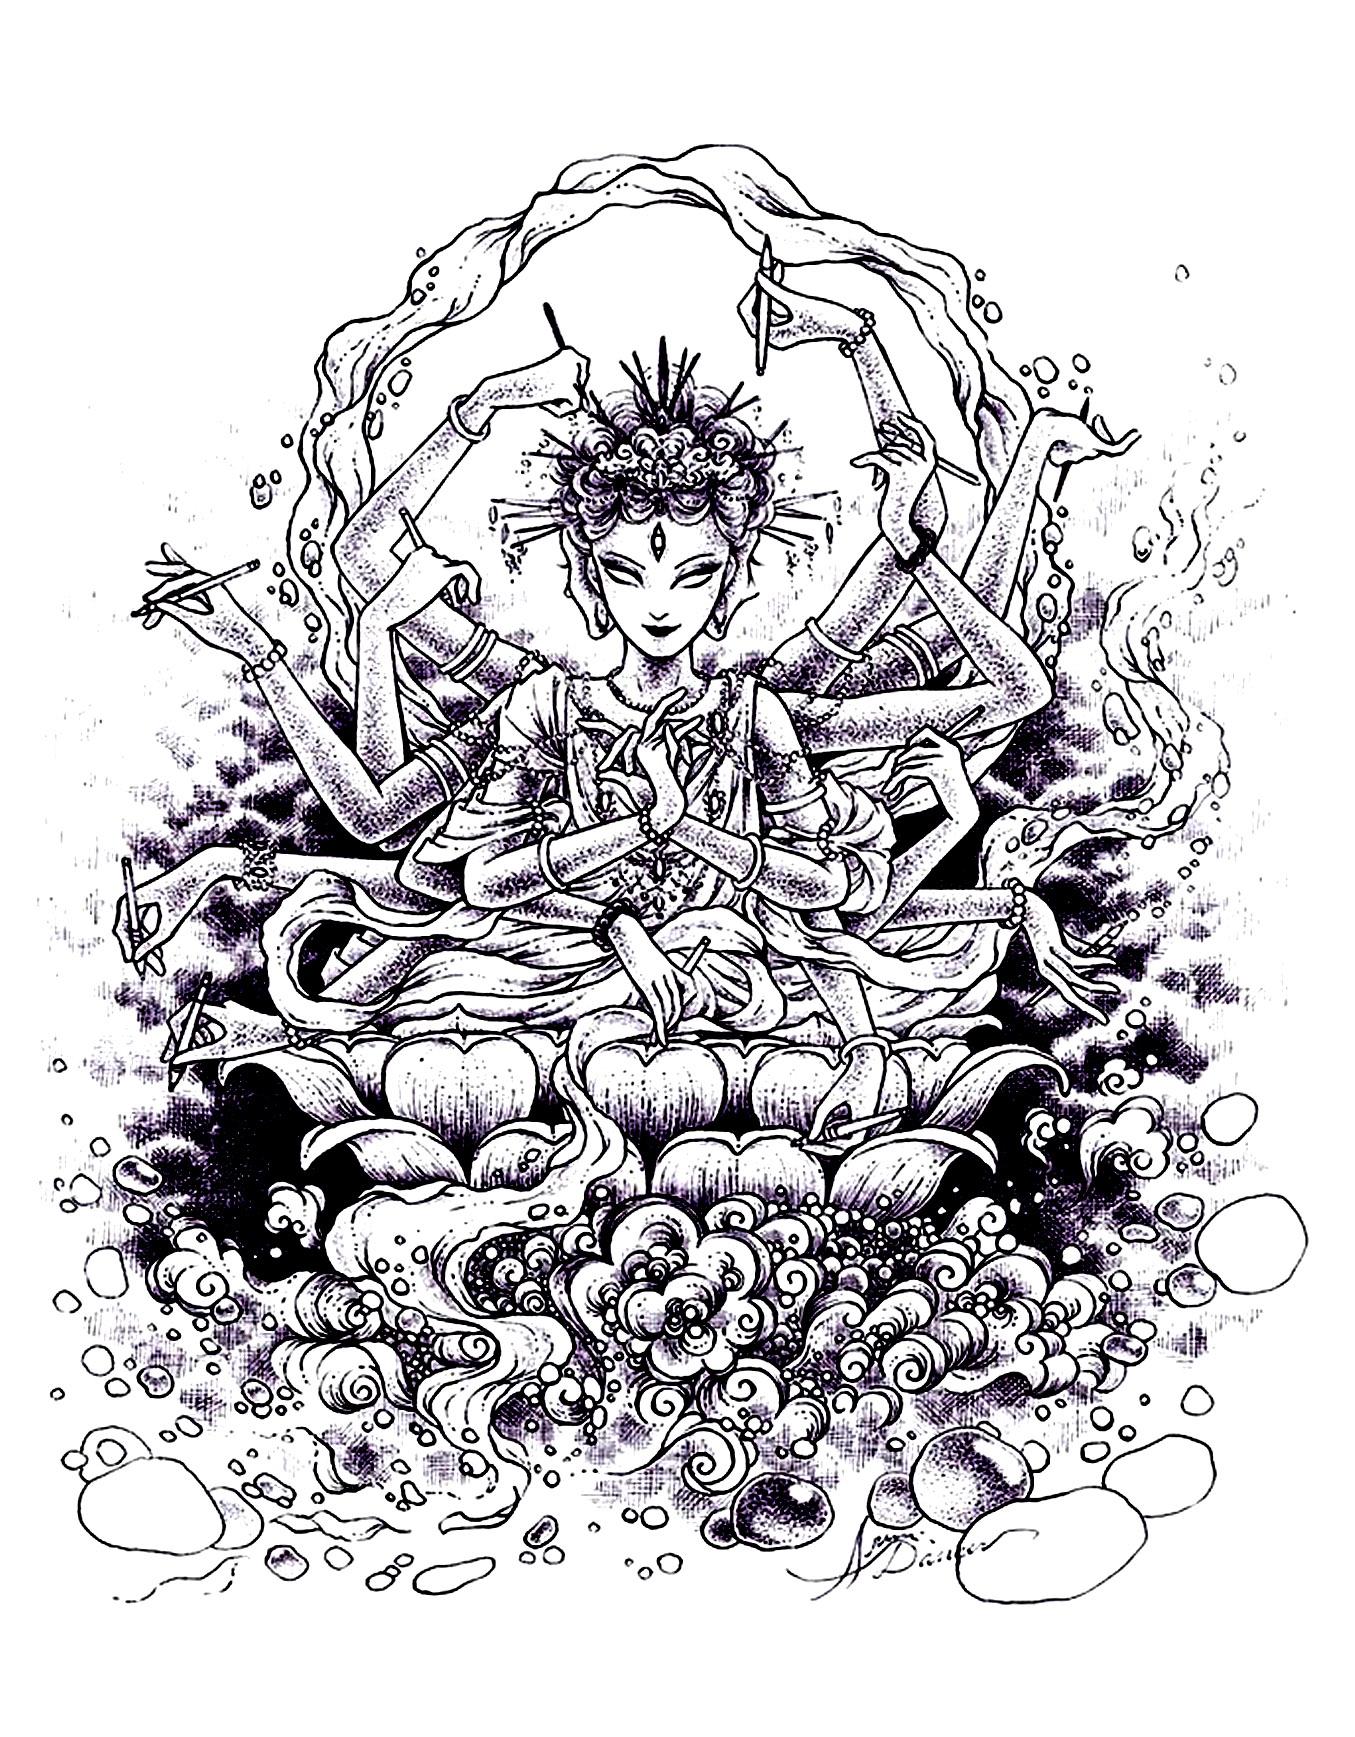 Anti Stress Zen 52133 Anti Stress Zen Disegni Da Colorare Per